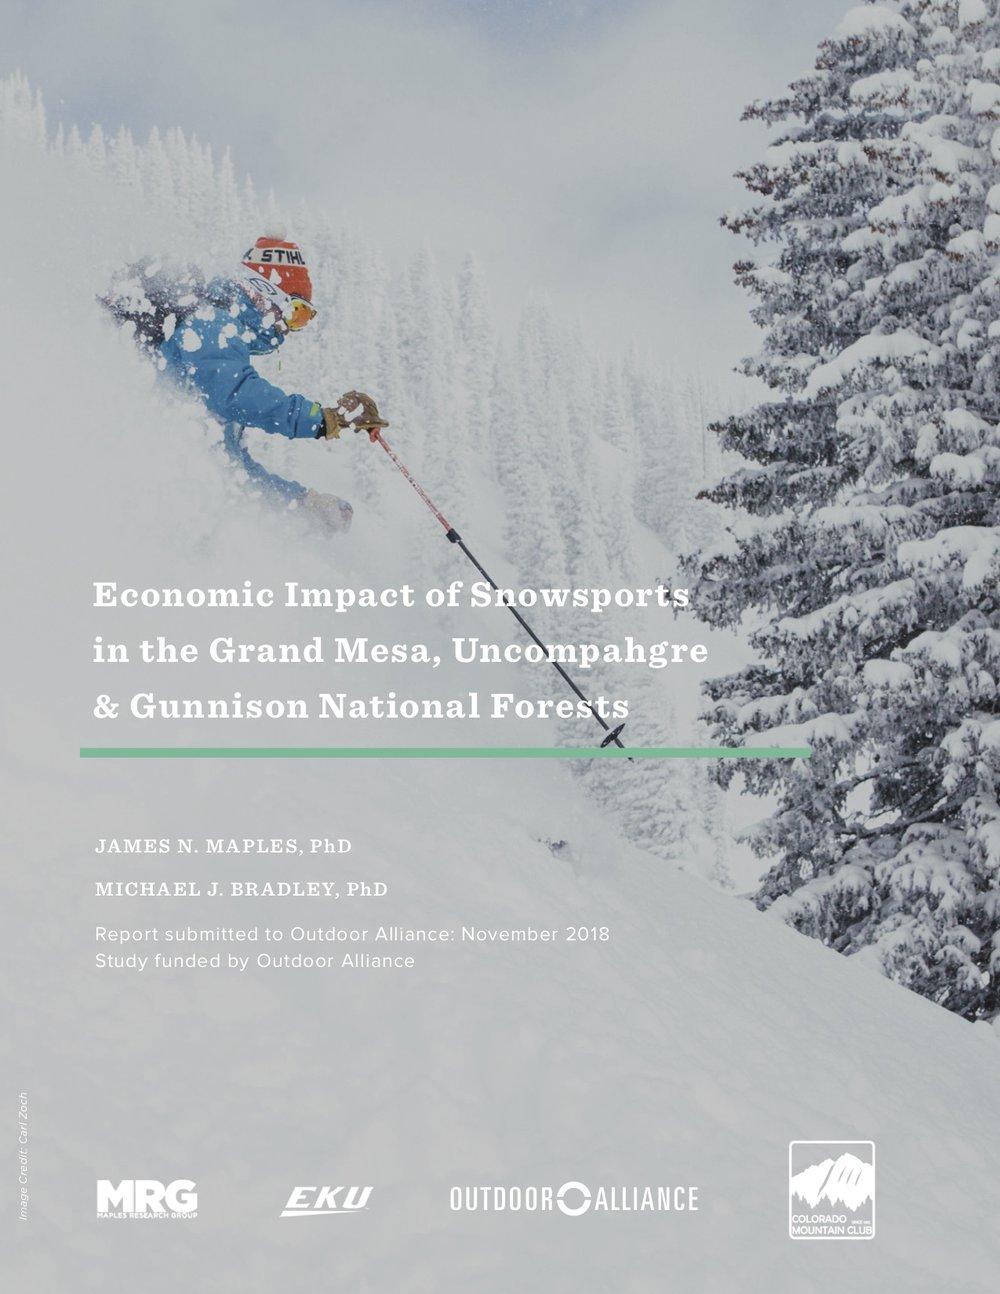 OA_CMUGNF_SnowsportsStudy2018 copy.jpg